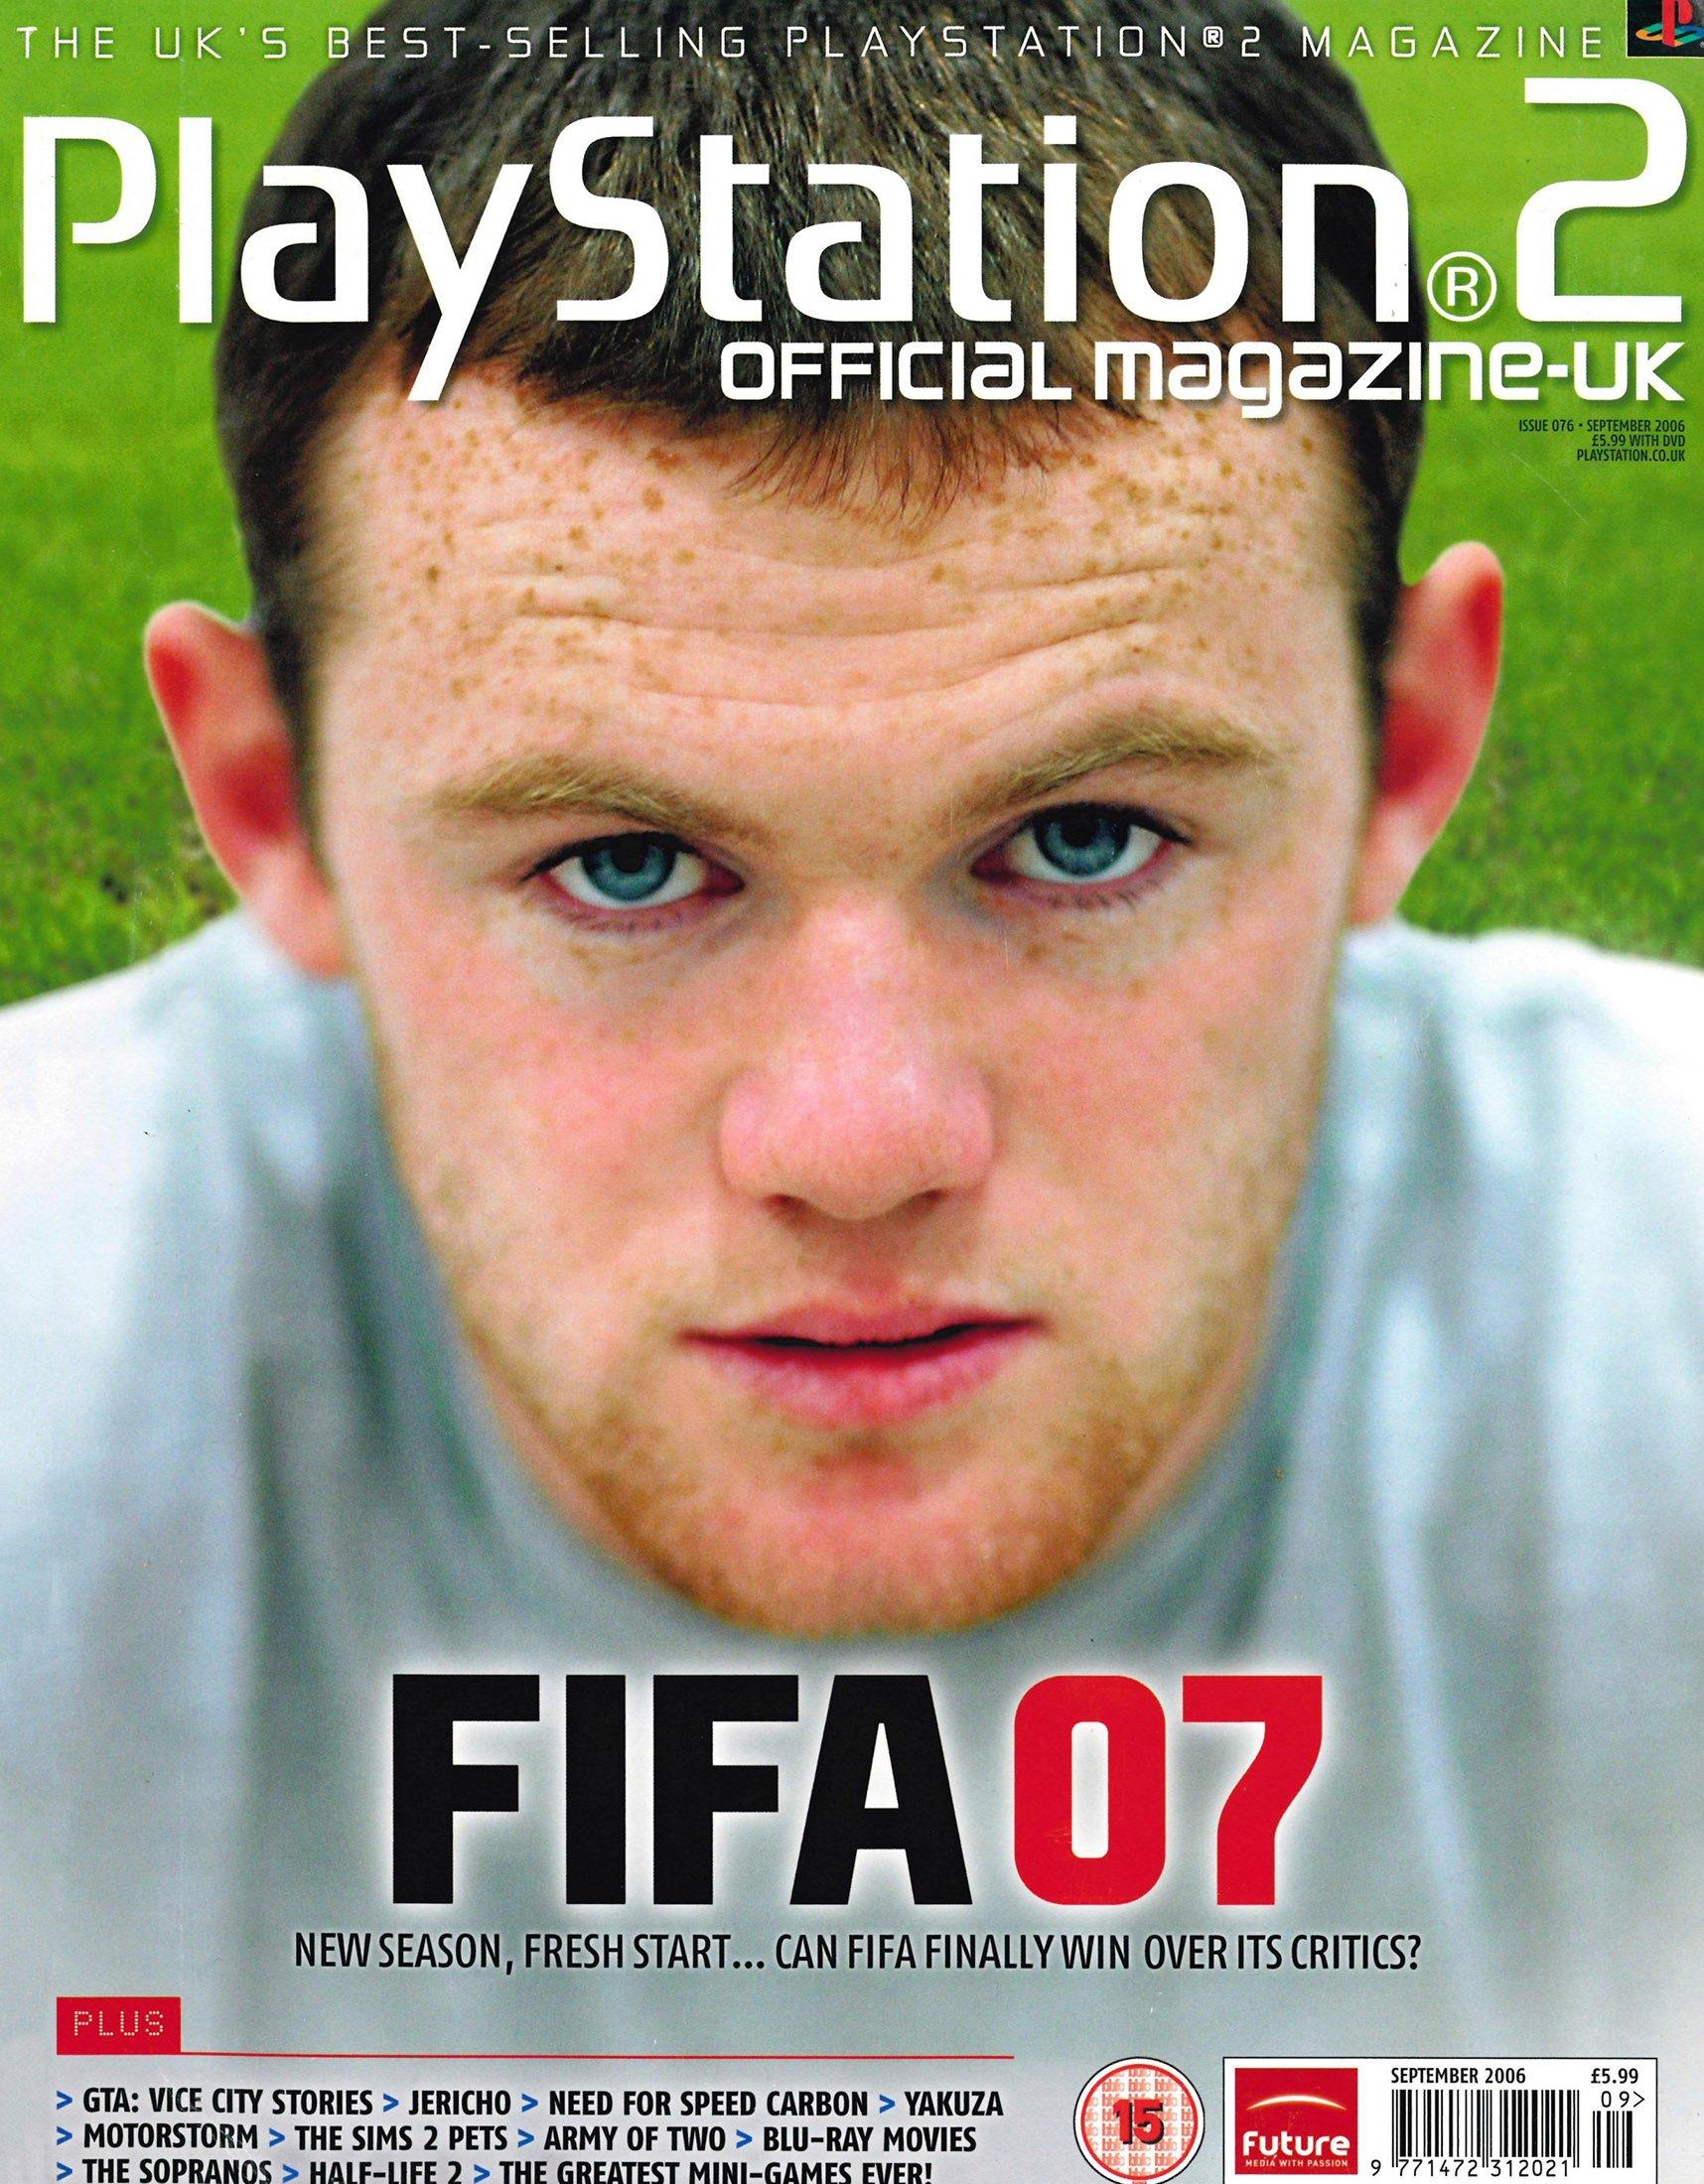 Official Playstation 2 Magazine UK 076 (September 2006)